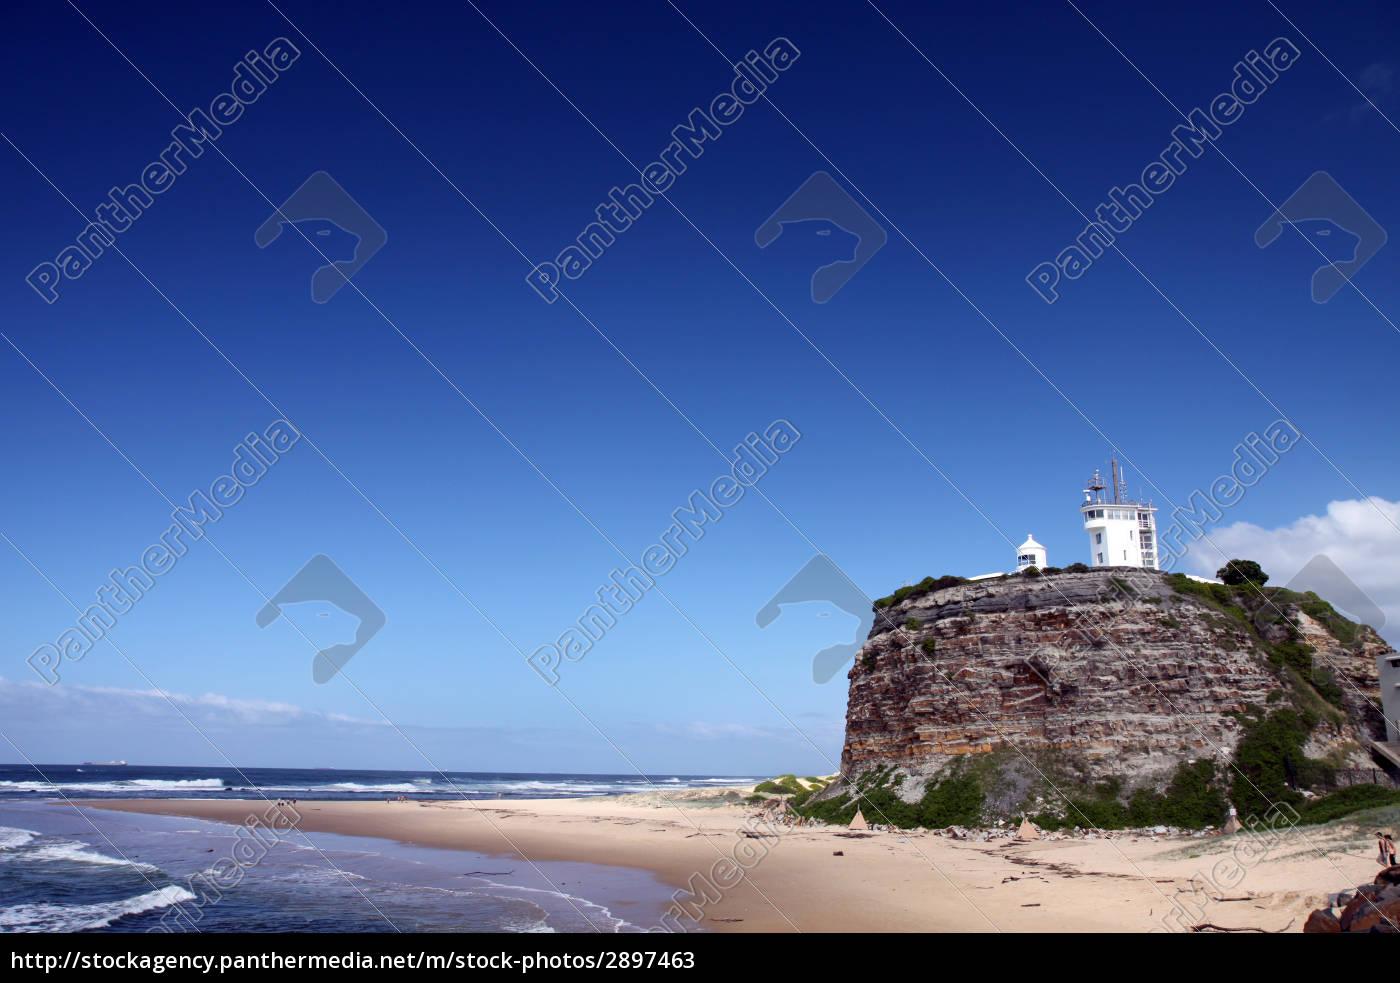 holiday, vacation, holidays, vacations, tourism, australia - 2897463